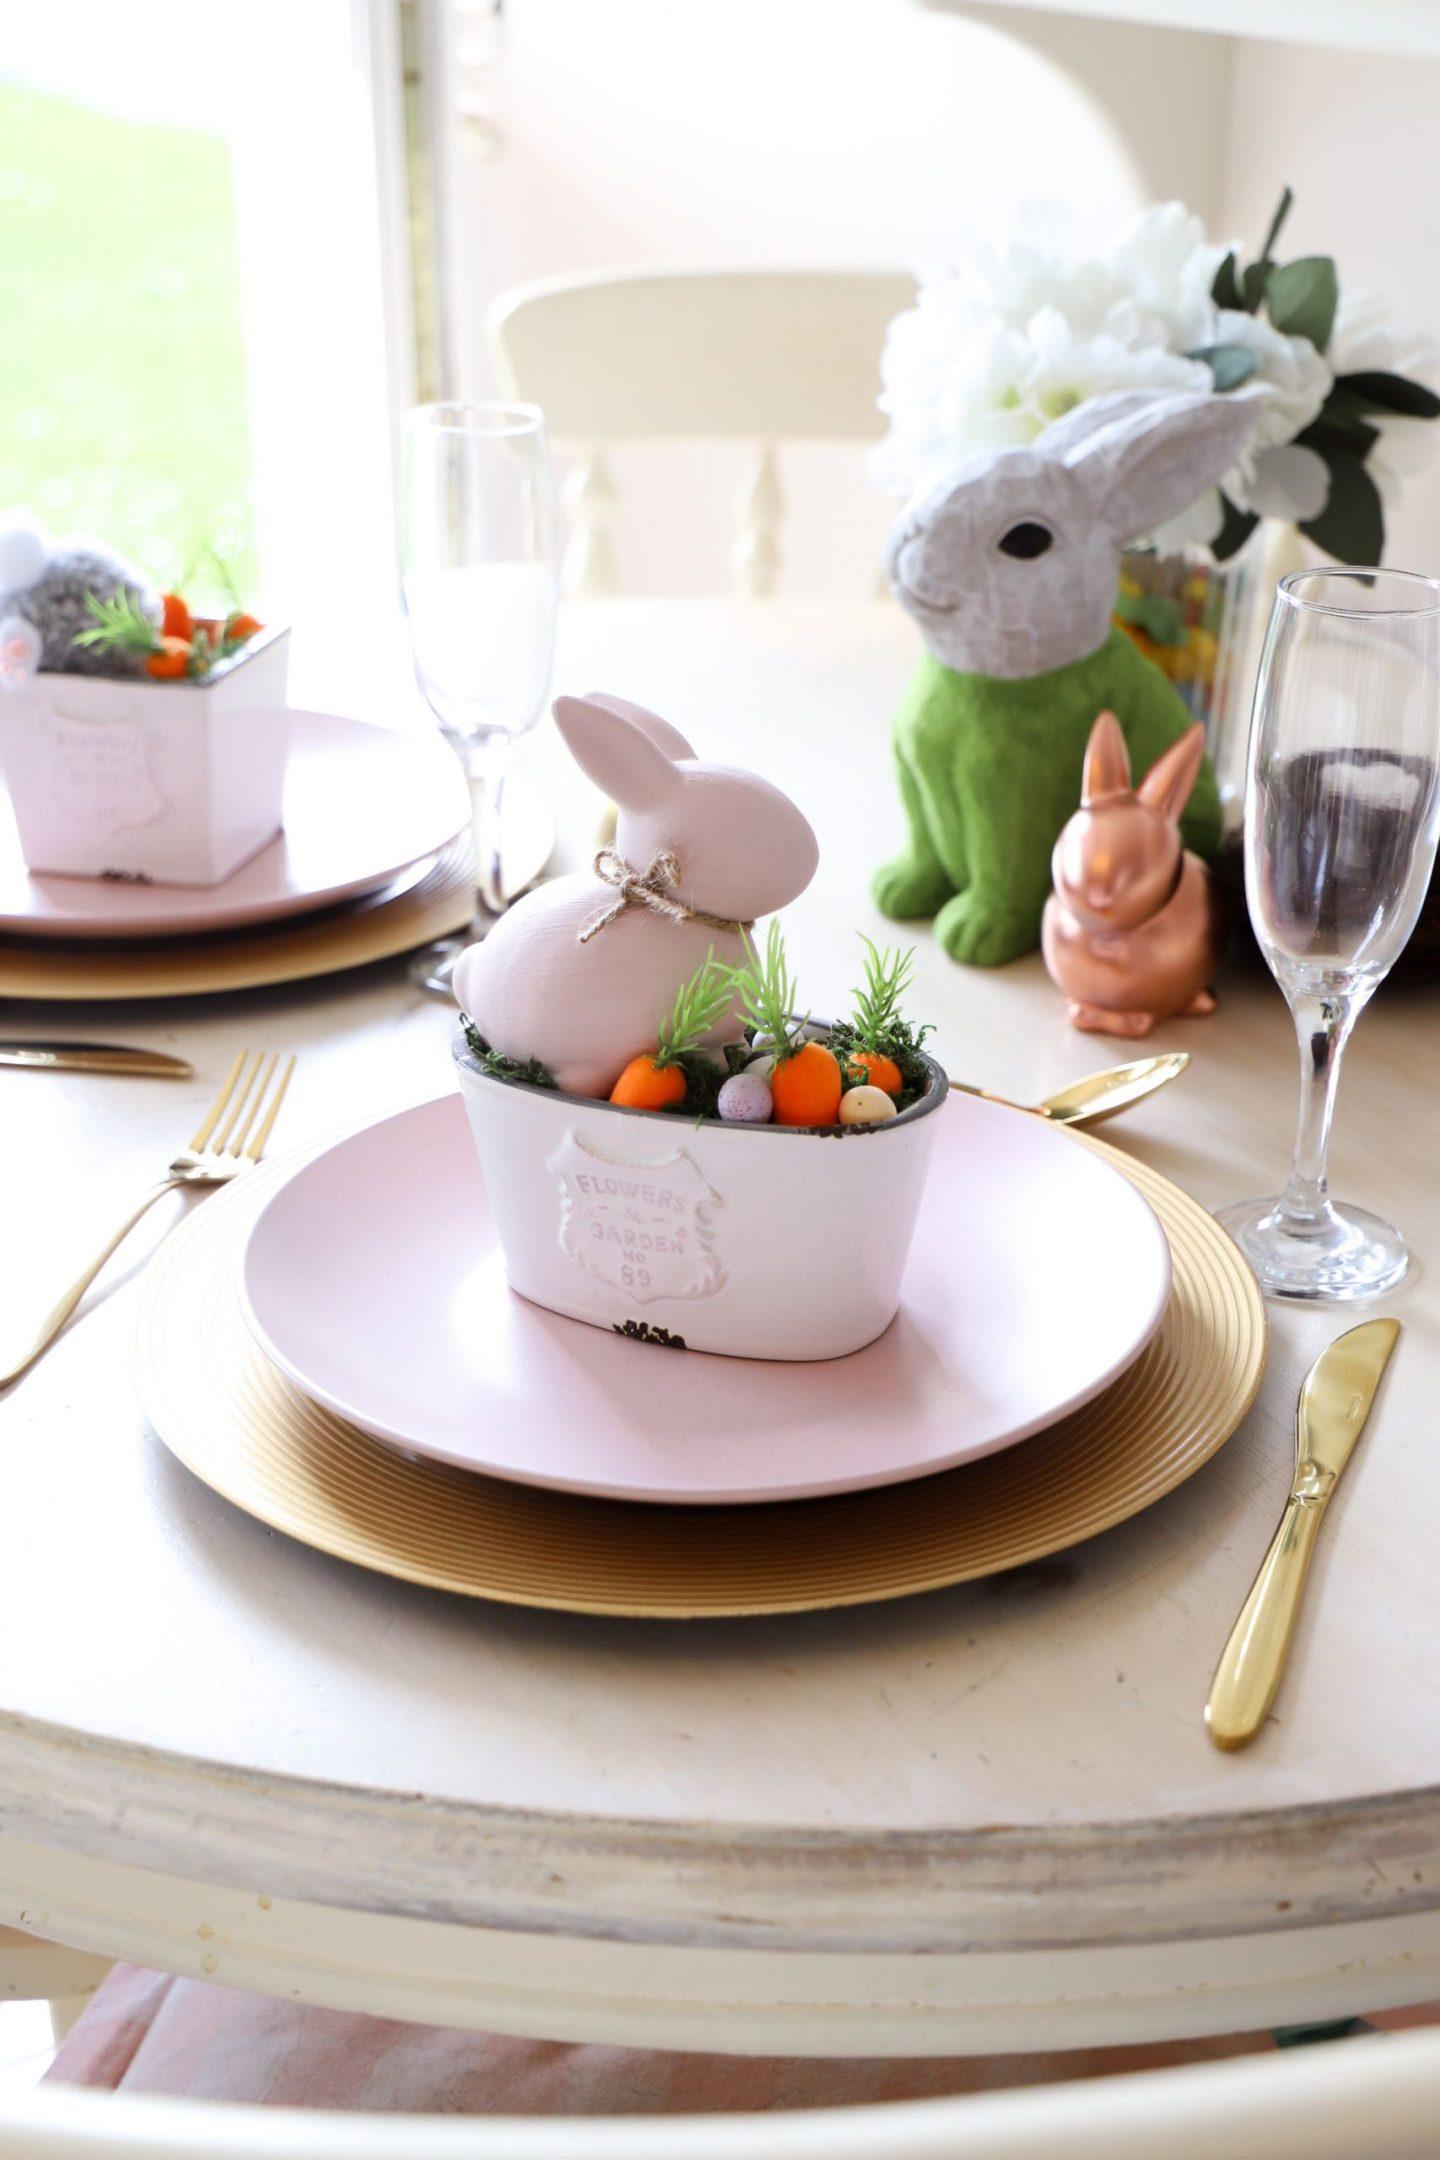 Budget friendly Easter DIYs